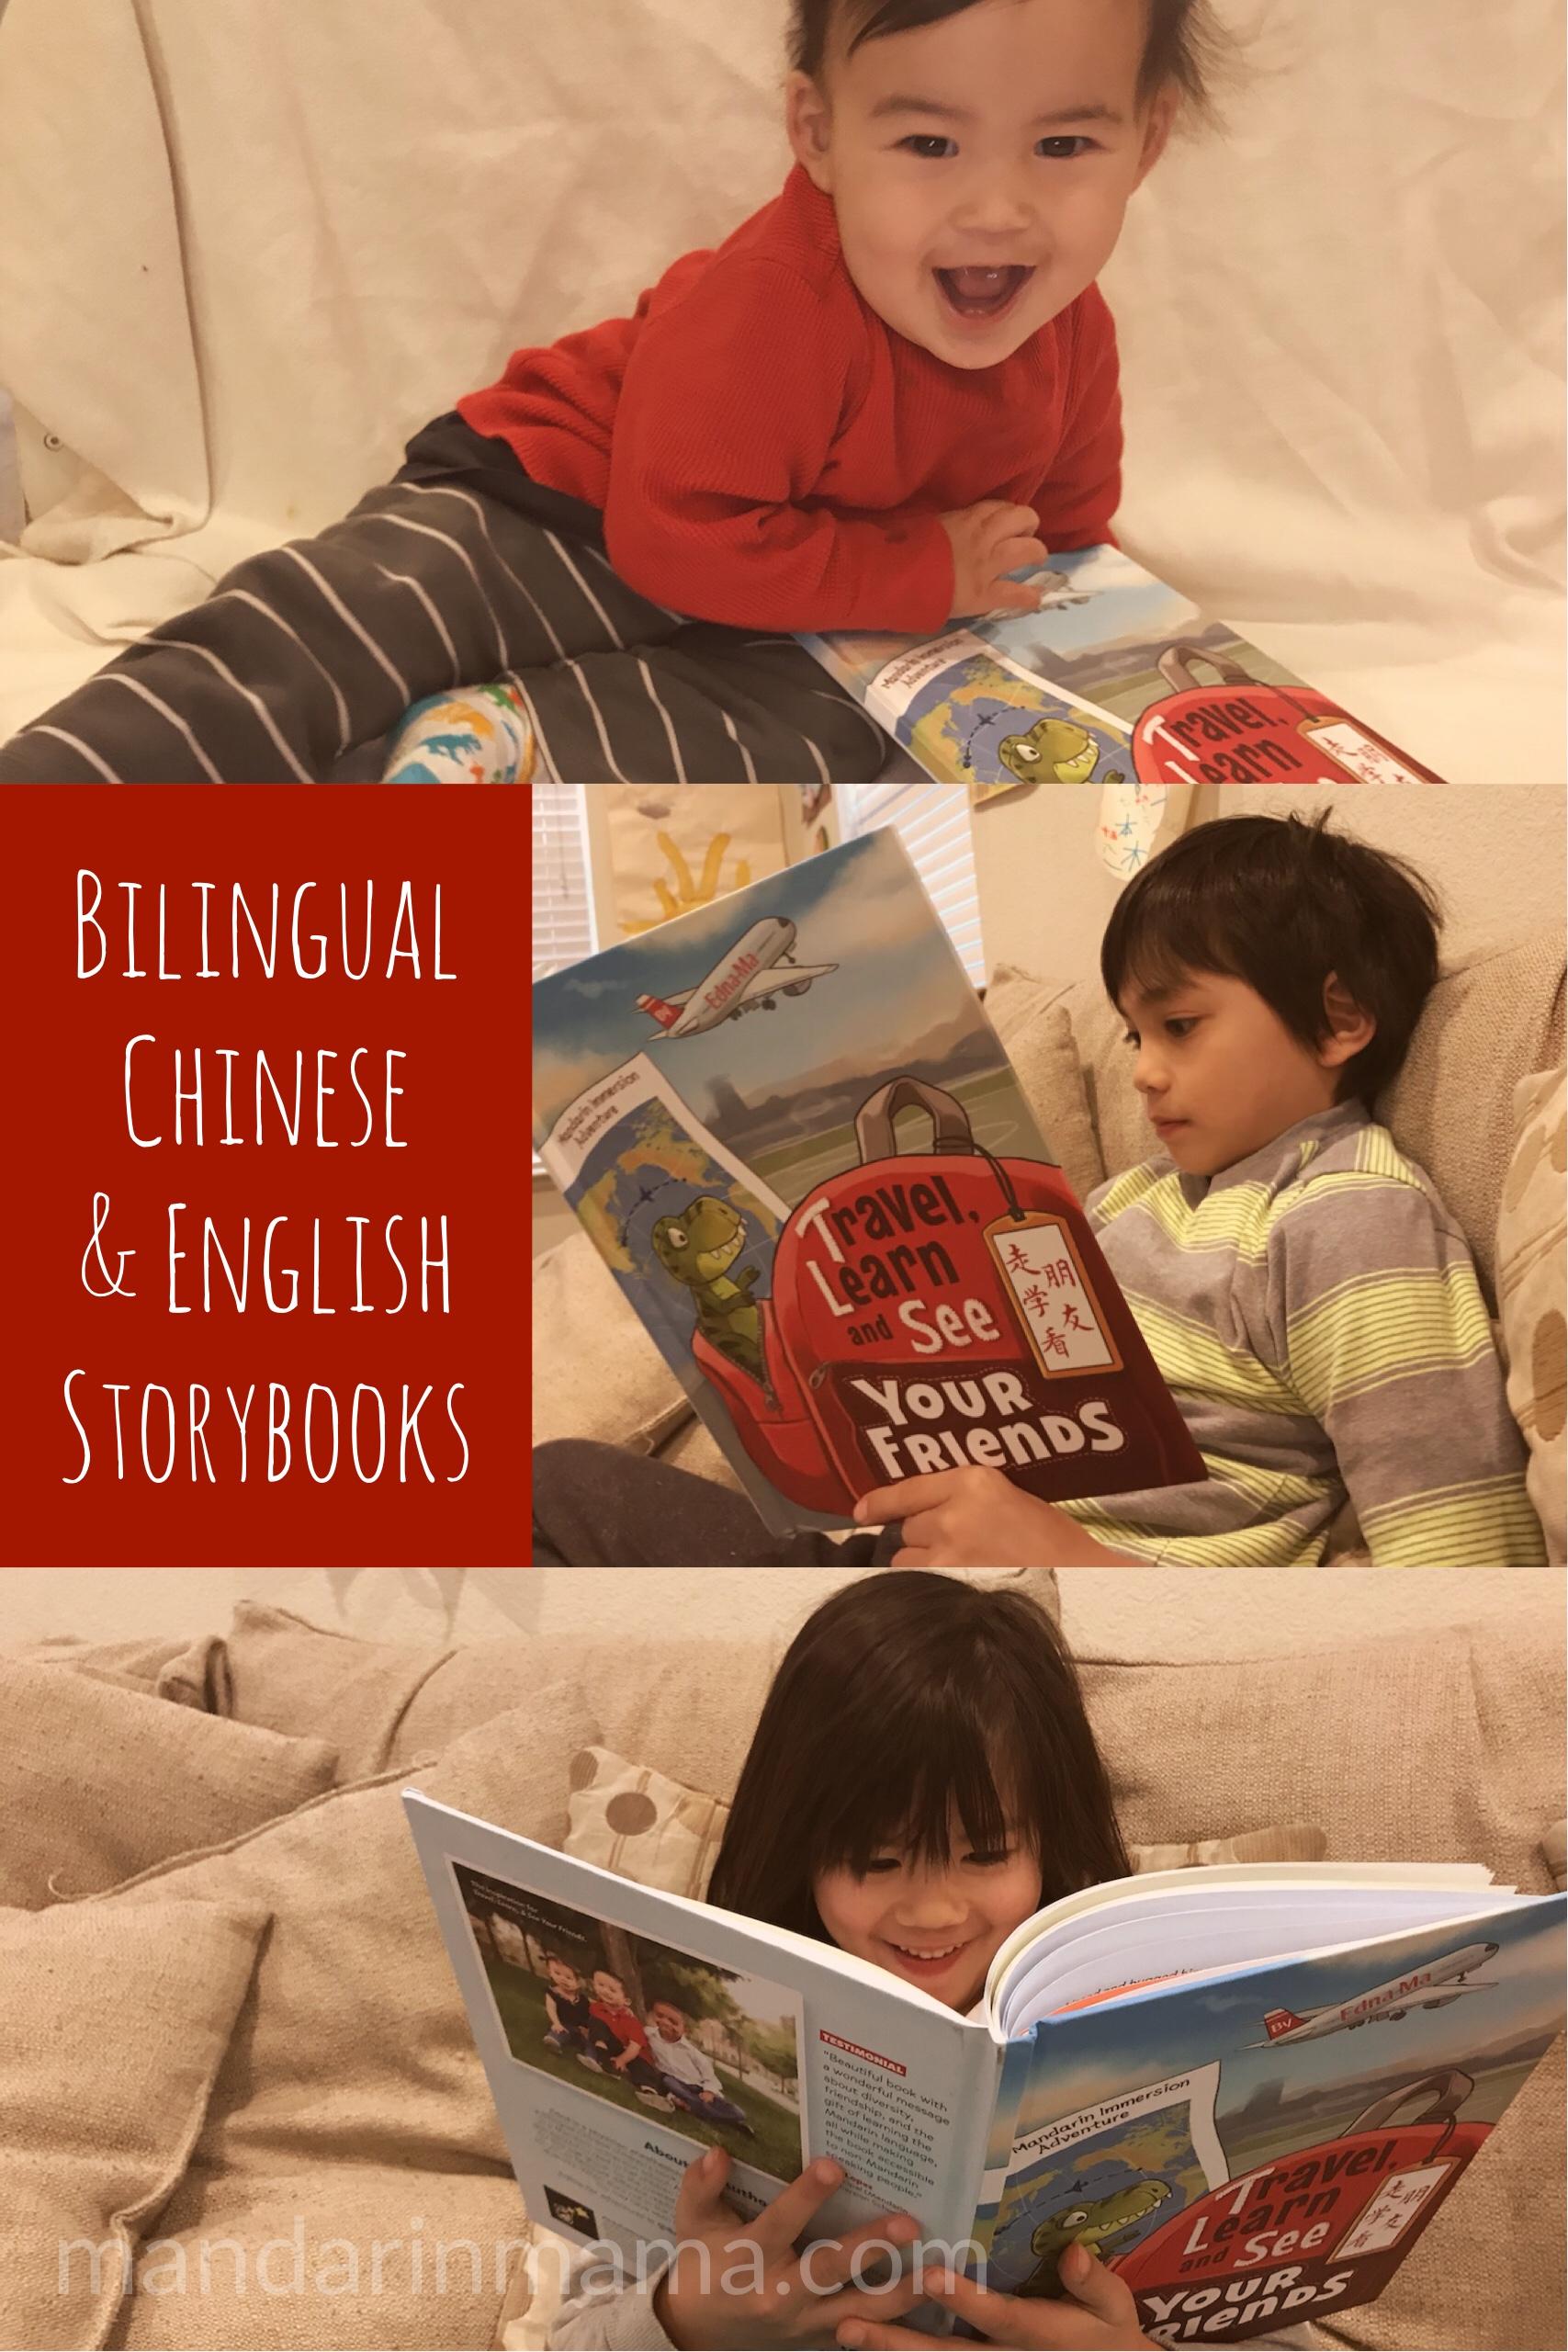 Bilingual Chinese and English Storybooks